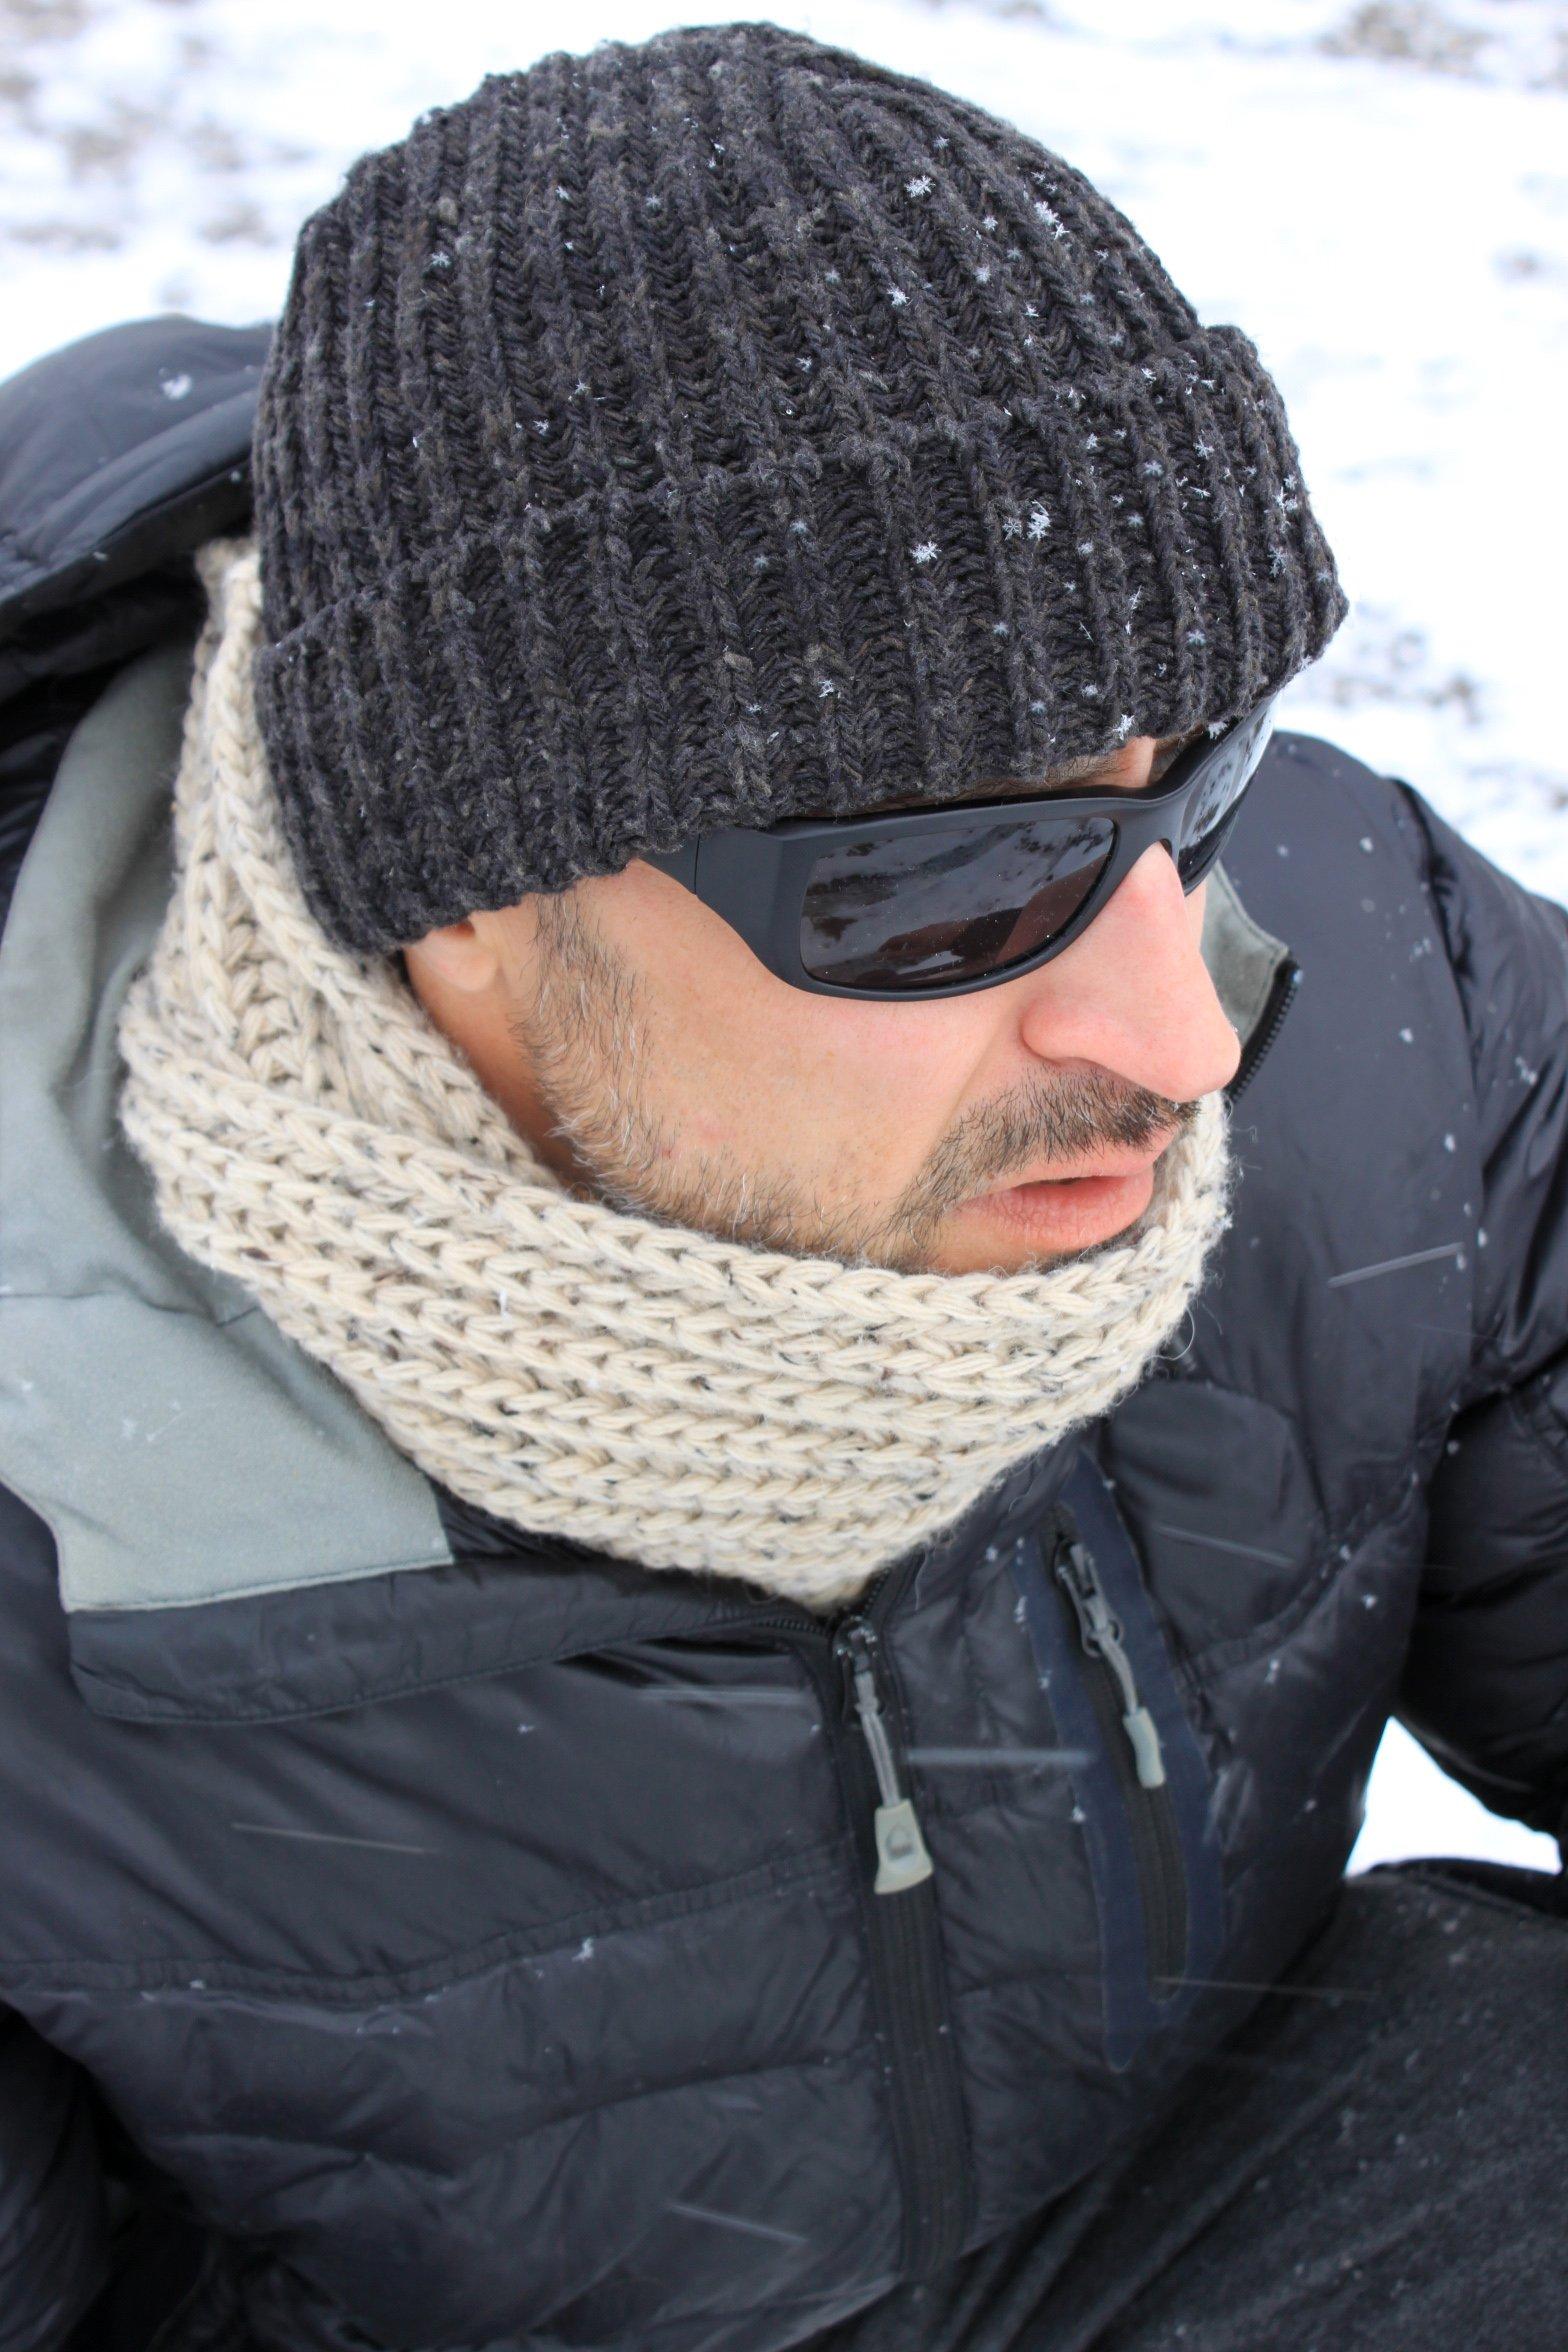 Icebox Knitting Dohm Otto Coal Winter Wool Hat Skull Cap Beanie for Men and Women